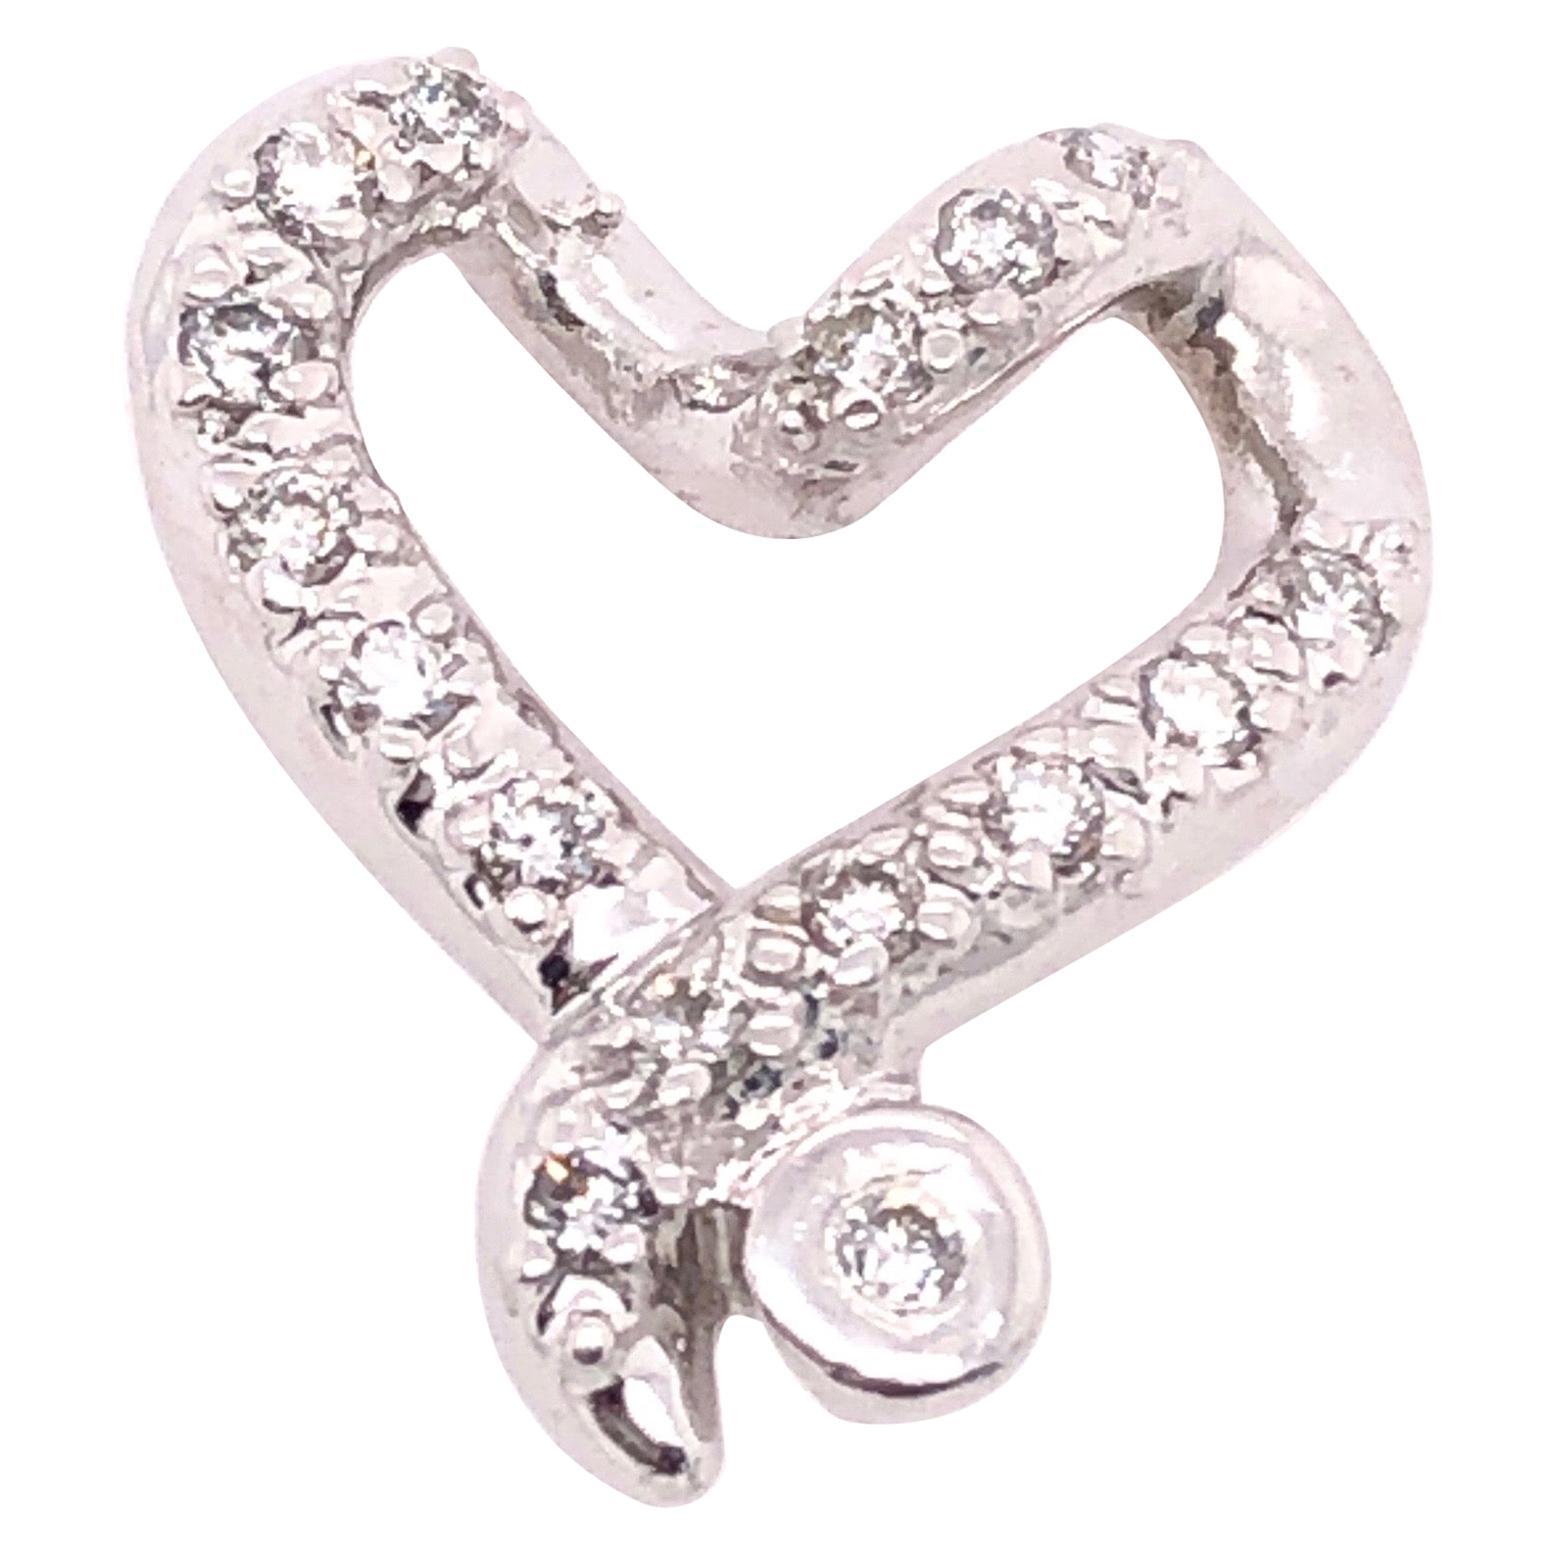 14 Karat White Gold and Diamond Heart Charm / Pendant